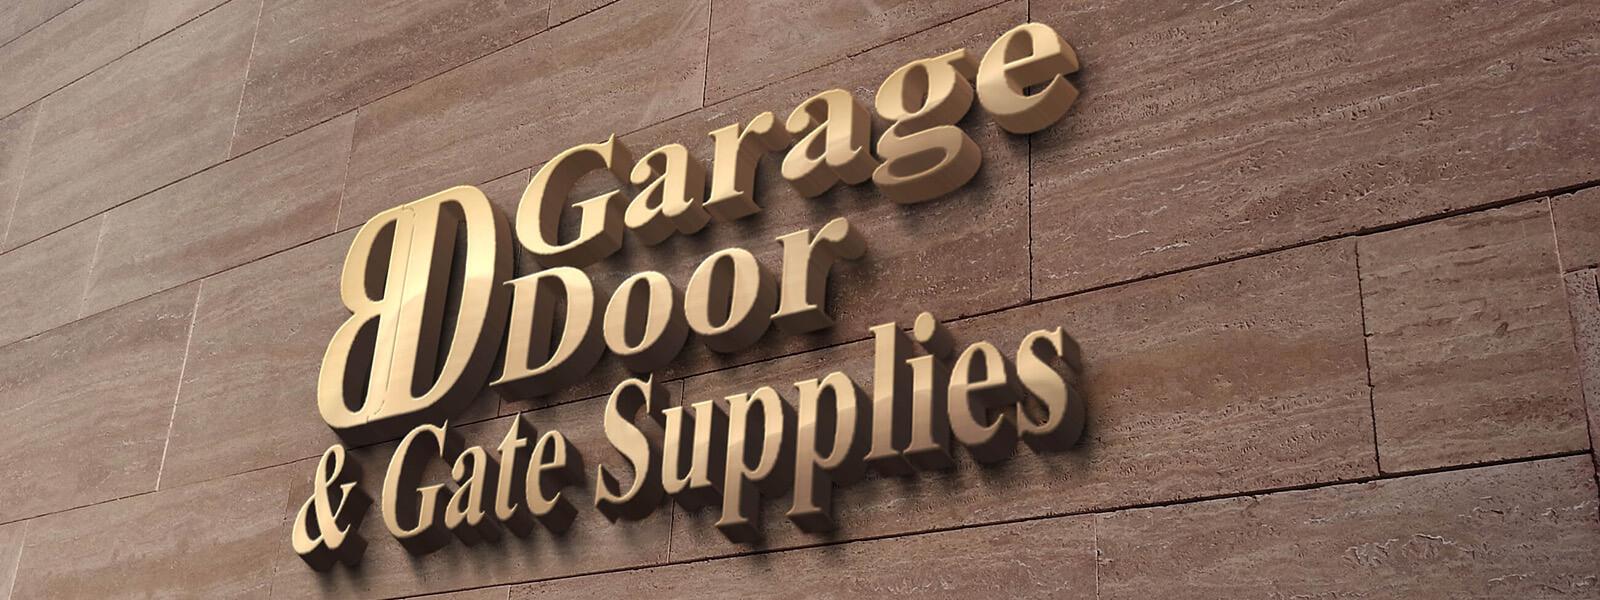 BD Garage Door And Gate Supplies Wall Logo